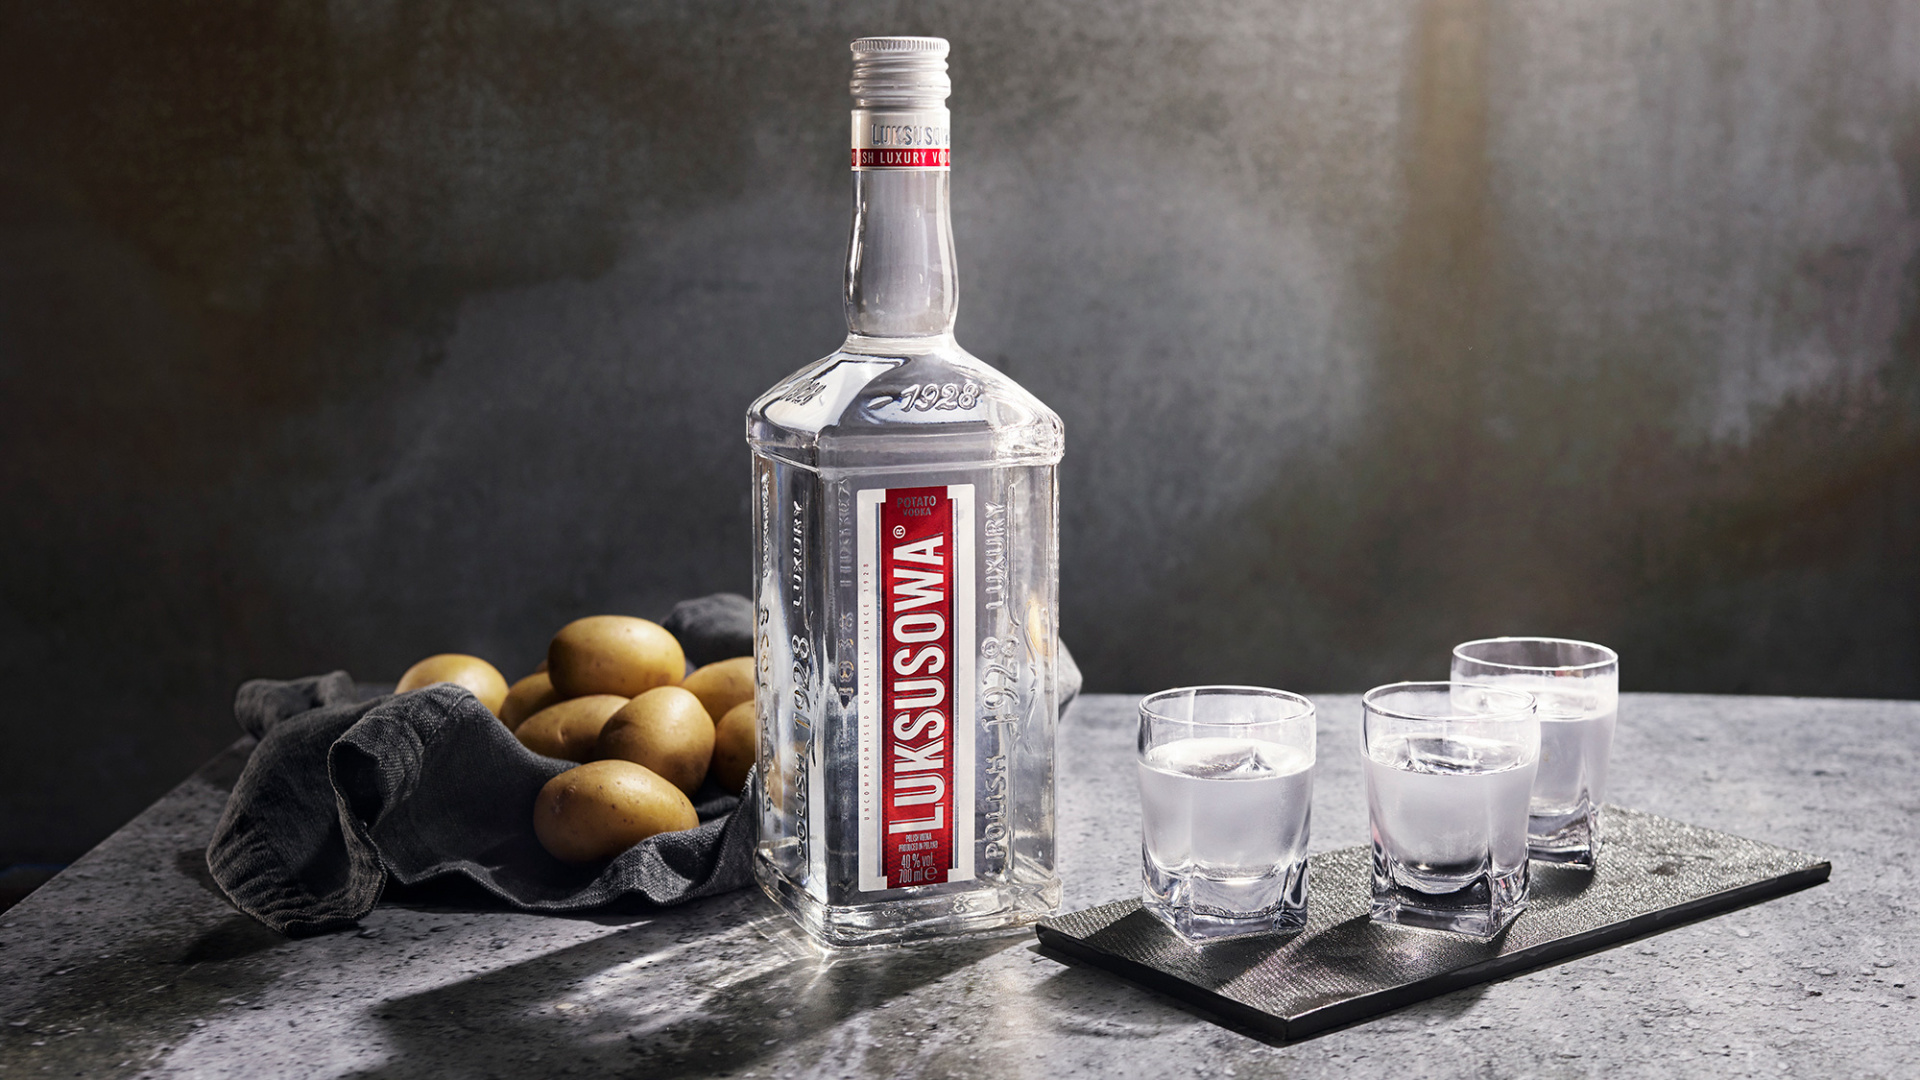 Luksusowa Vodka